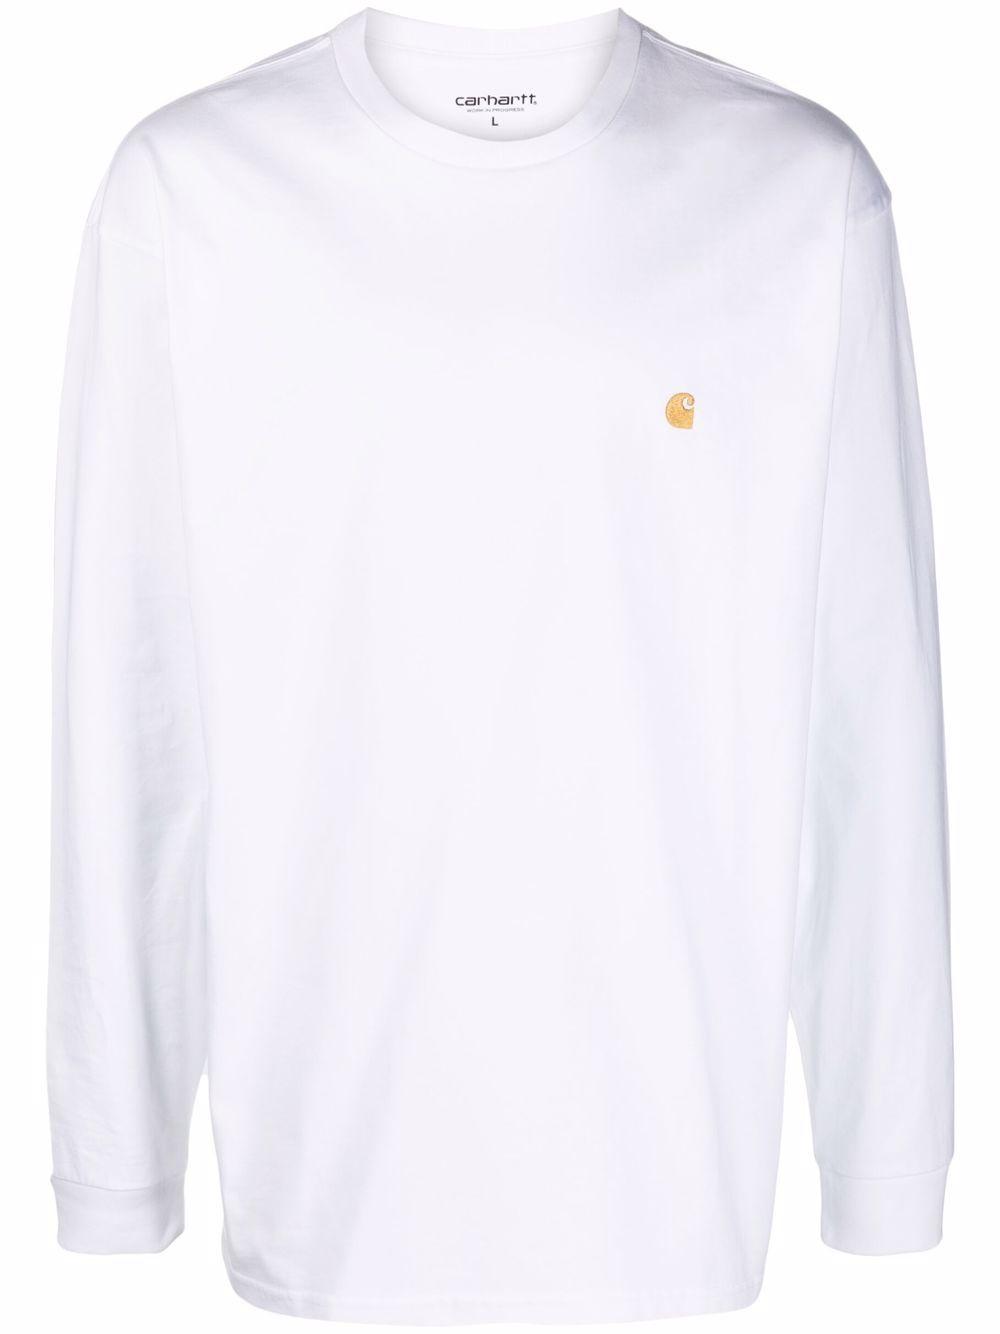 t-shirt manica lunga uomo bianca in cotone CARHARTT WIP   T-shirt   I02639200R.XX